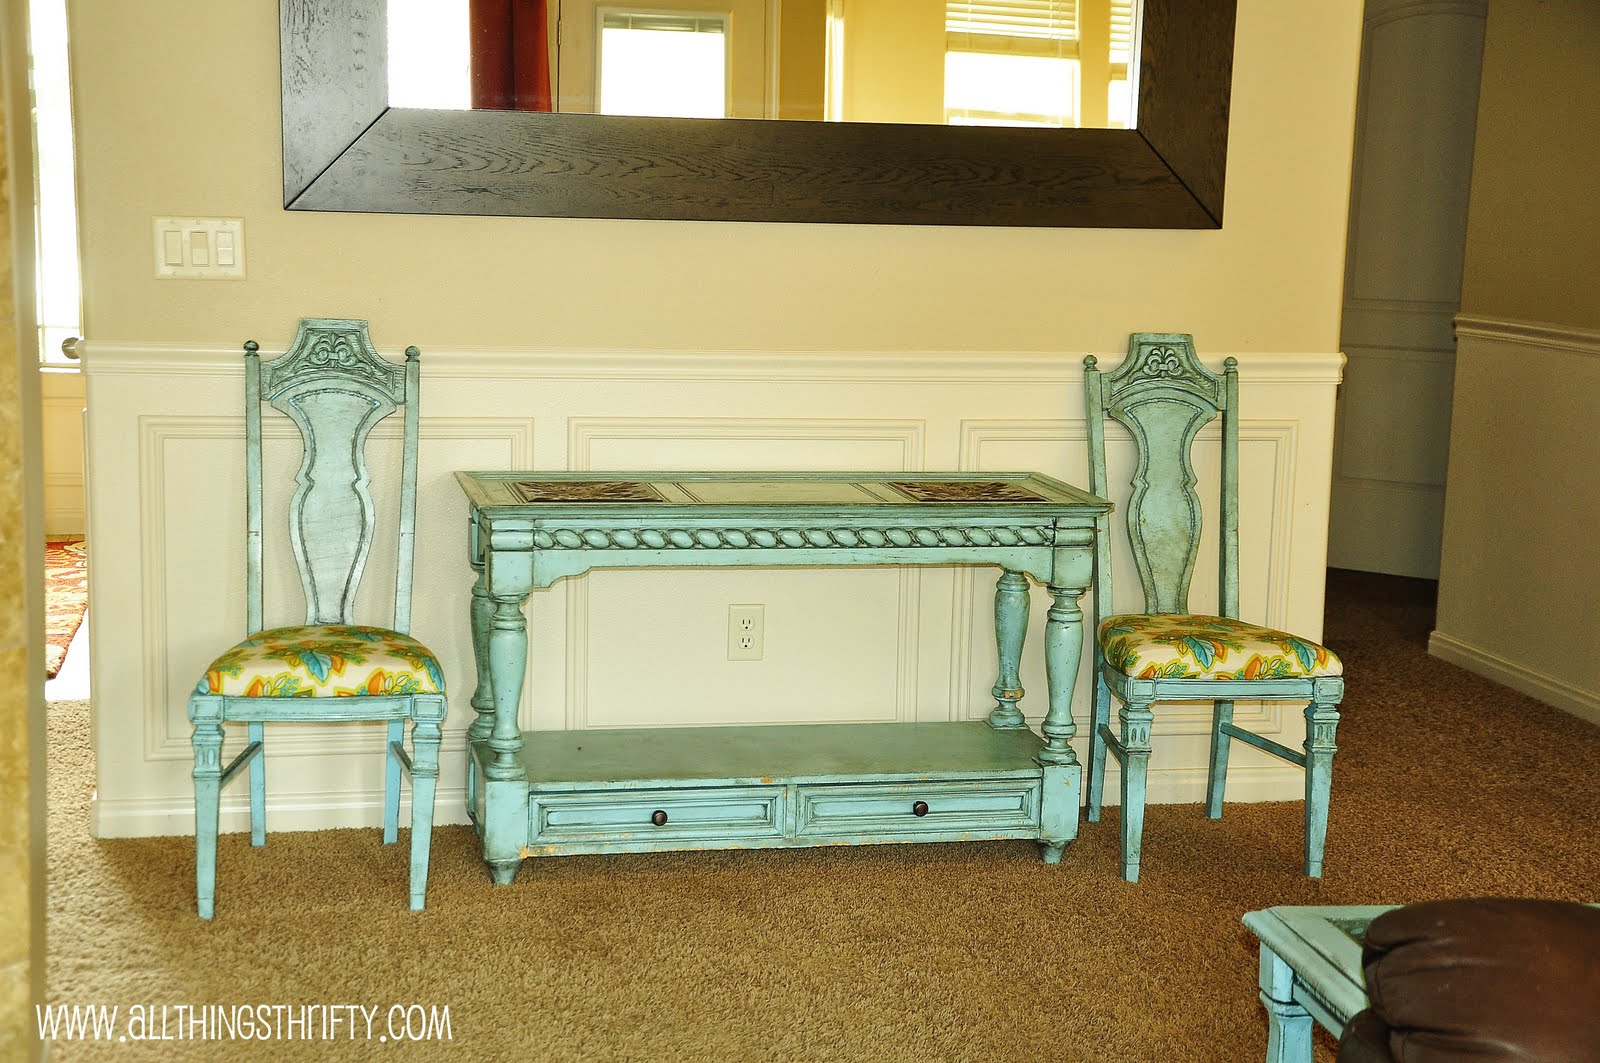 Antique Furniture And Canopy Bed: Antique Walnut Furniture. Refinishing  Furniture ...